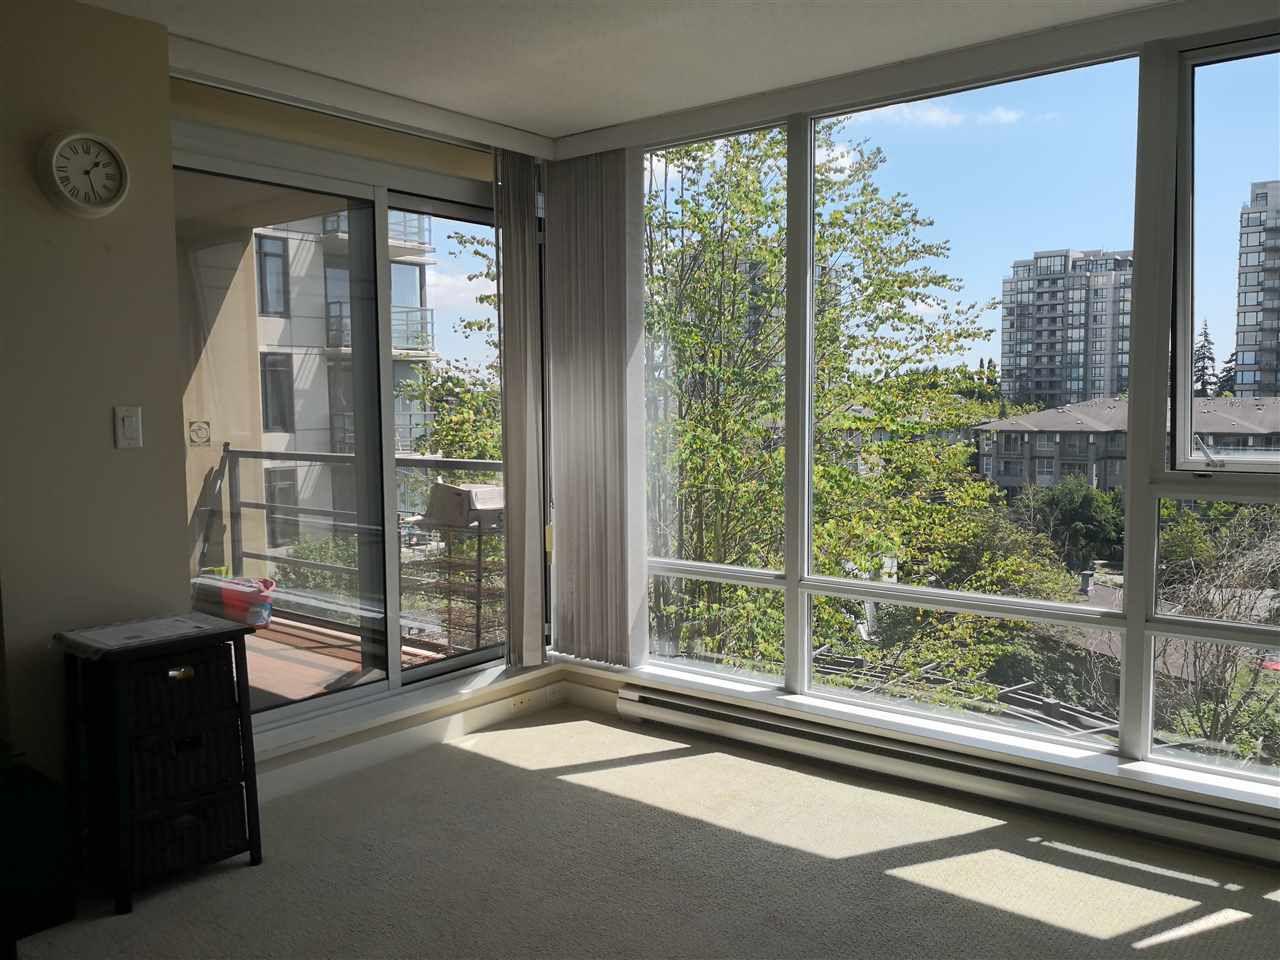 Main Photo: 619 9171 FERNDALE Road in Richmond: McLennan North Condo for sale : MLS®# R2386572